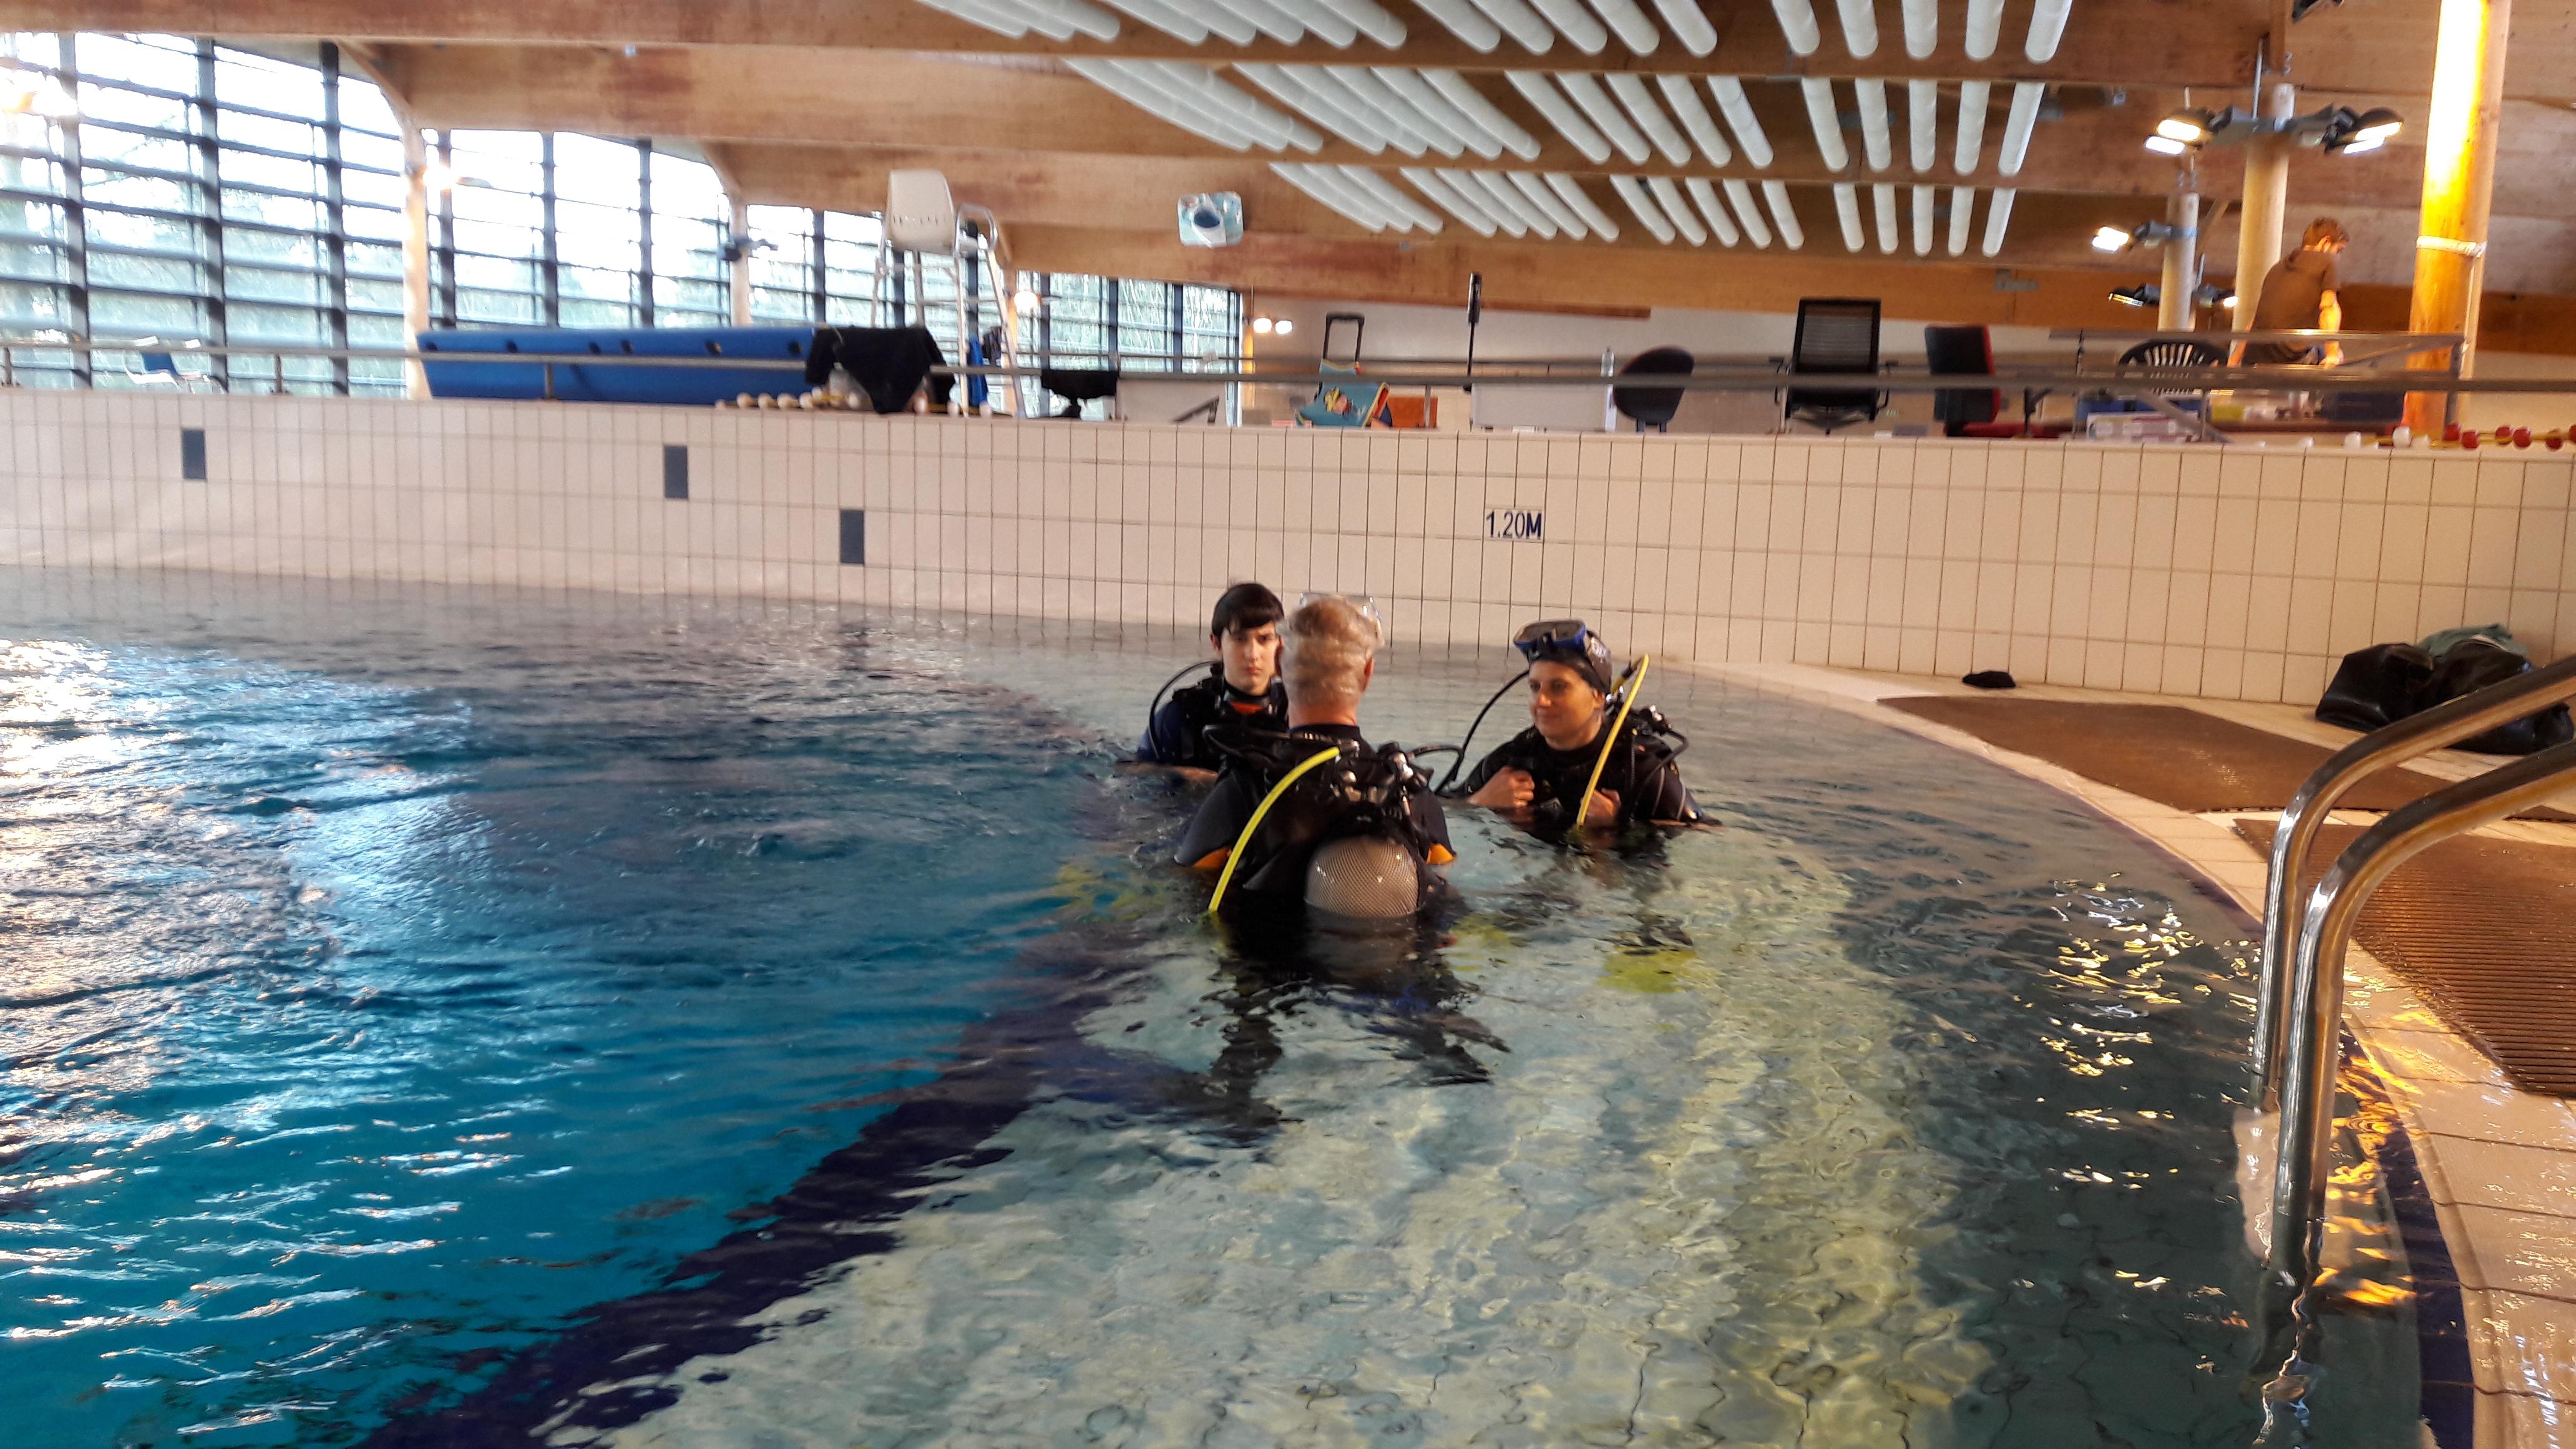 Sortie la fosse de la piscine des gayeulles club for Piscine kercado